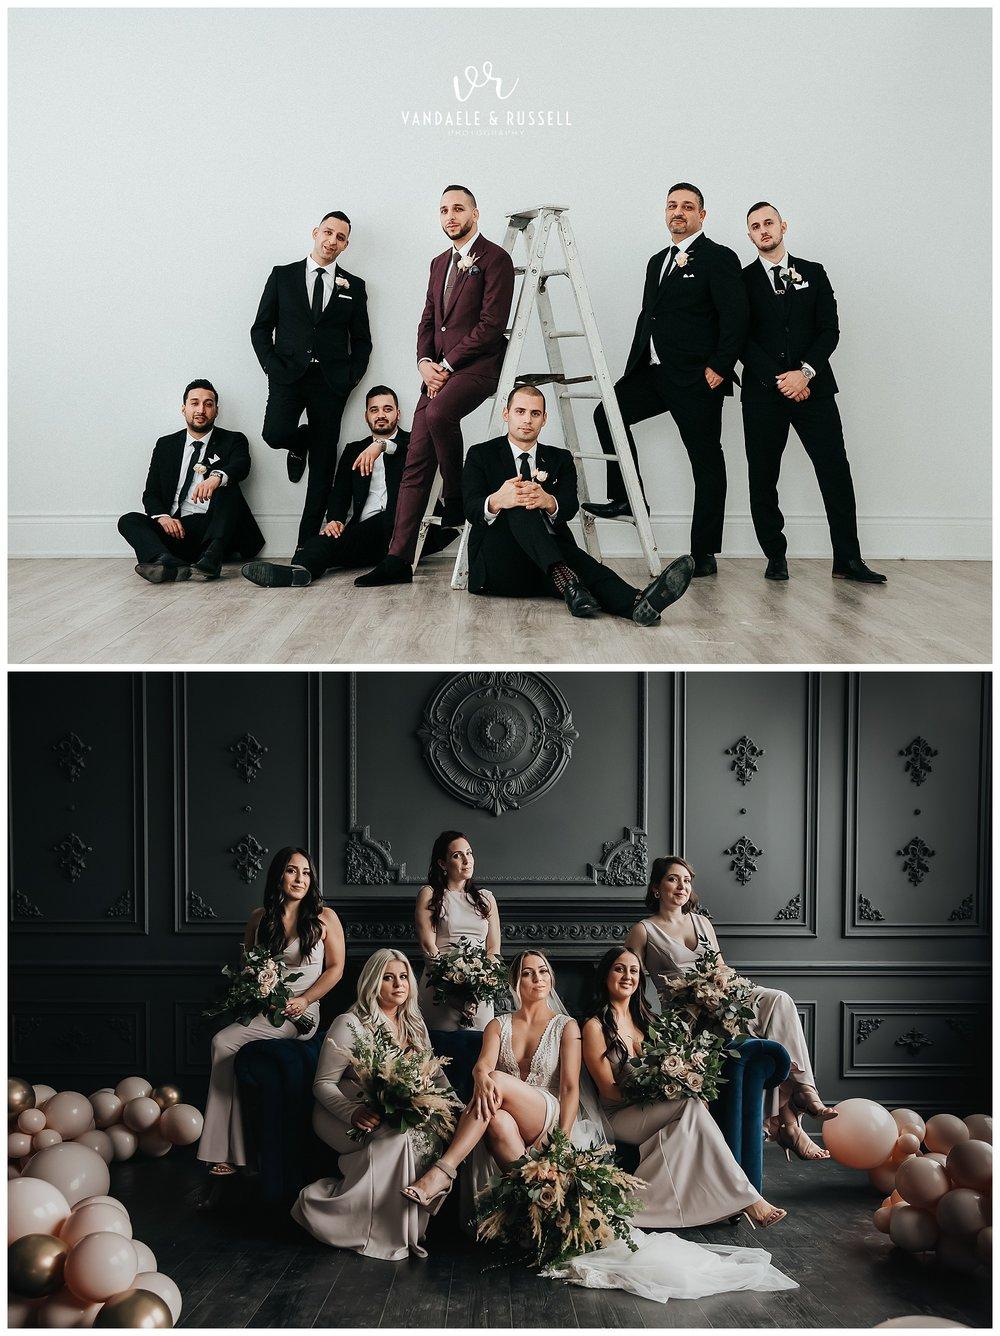 Joanna-Christos-Grand-Luxe-Wedding-Photos-Mint-Room-Toronto-VanDaele-Russell_0079.jpg